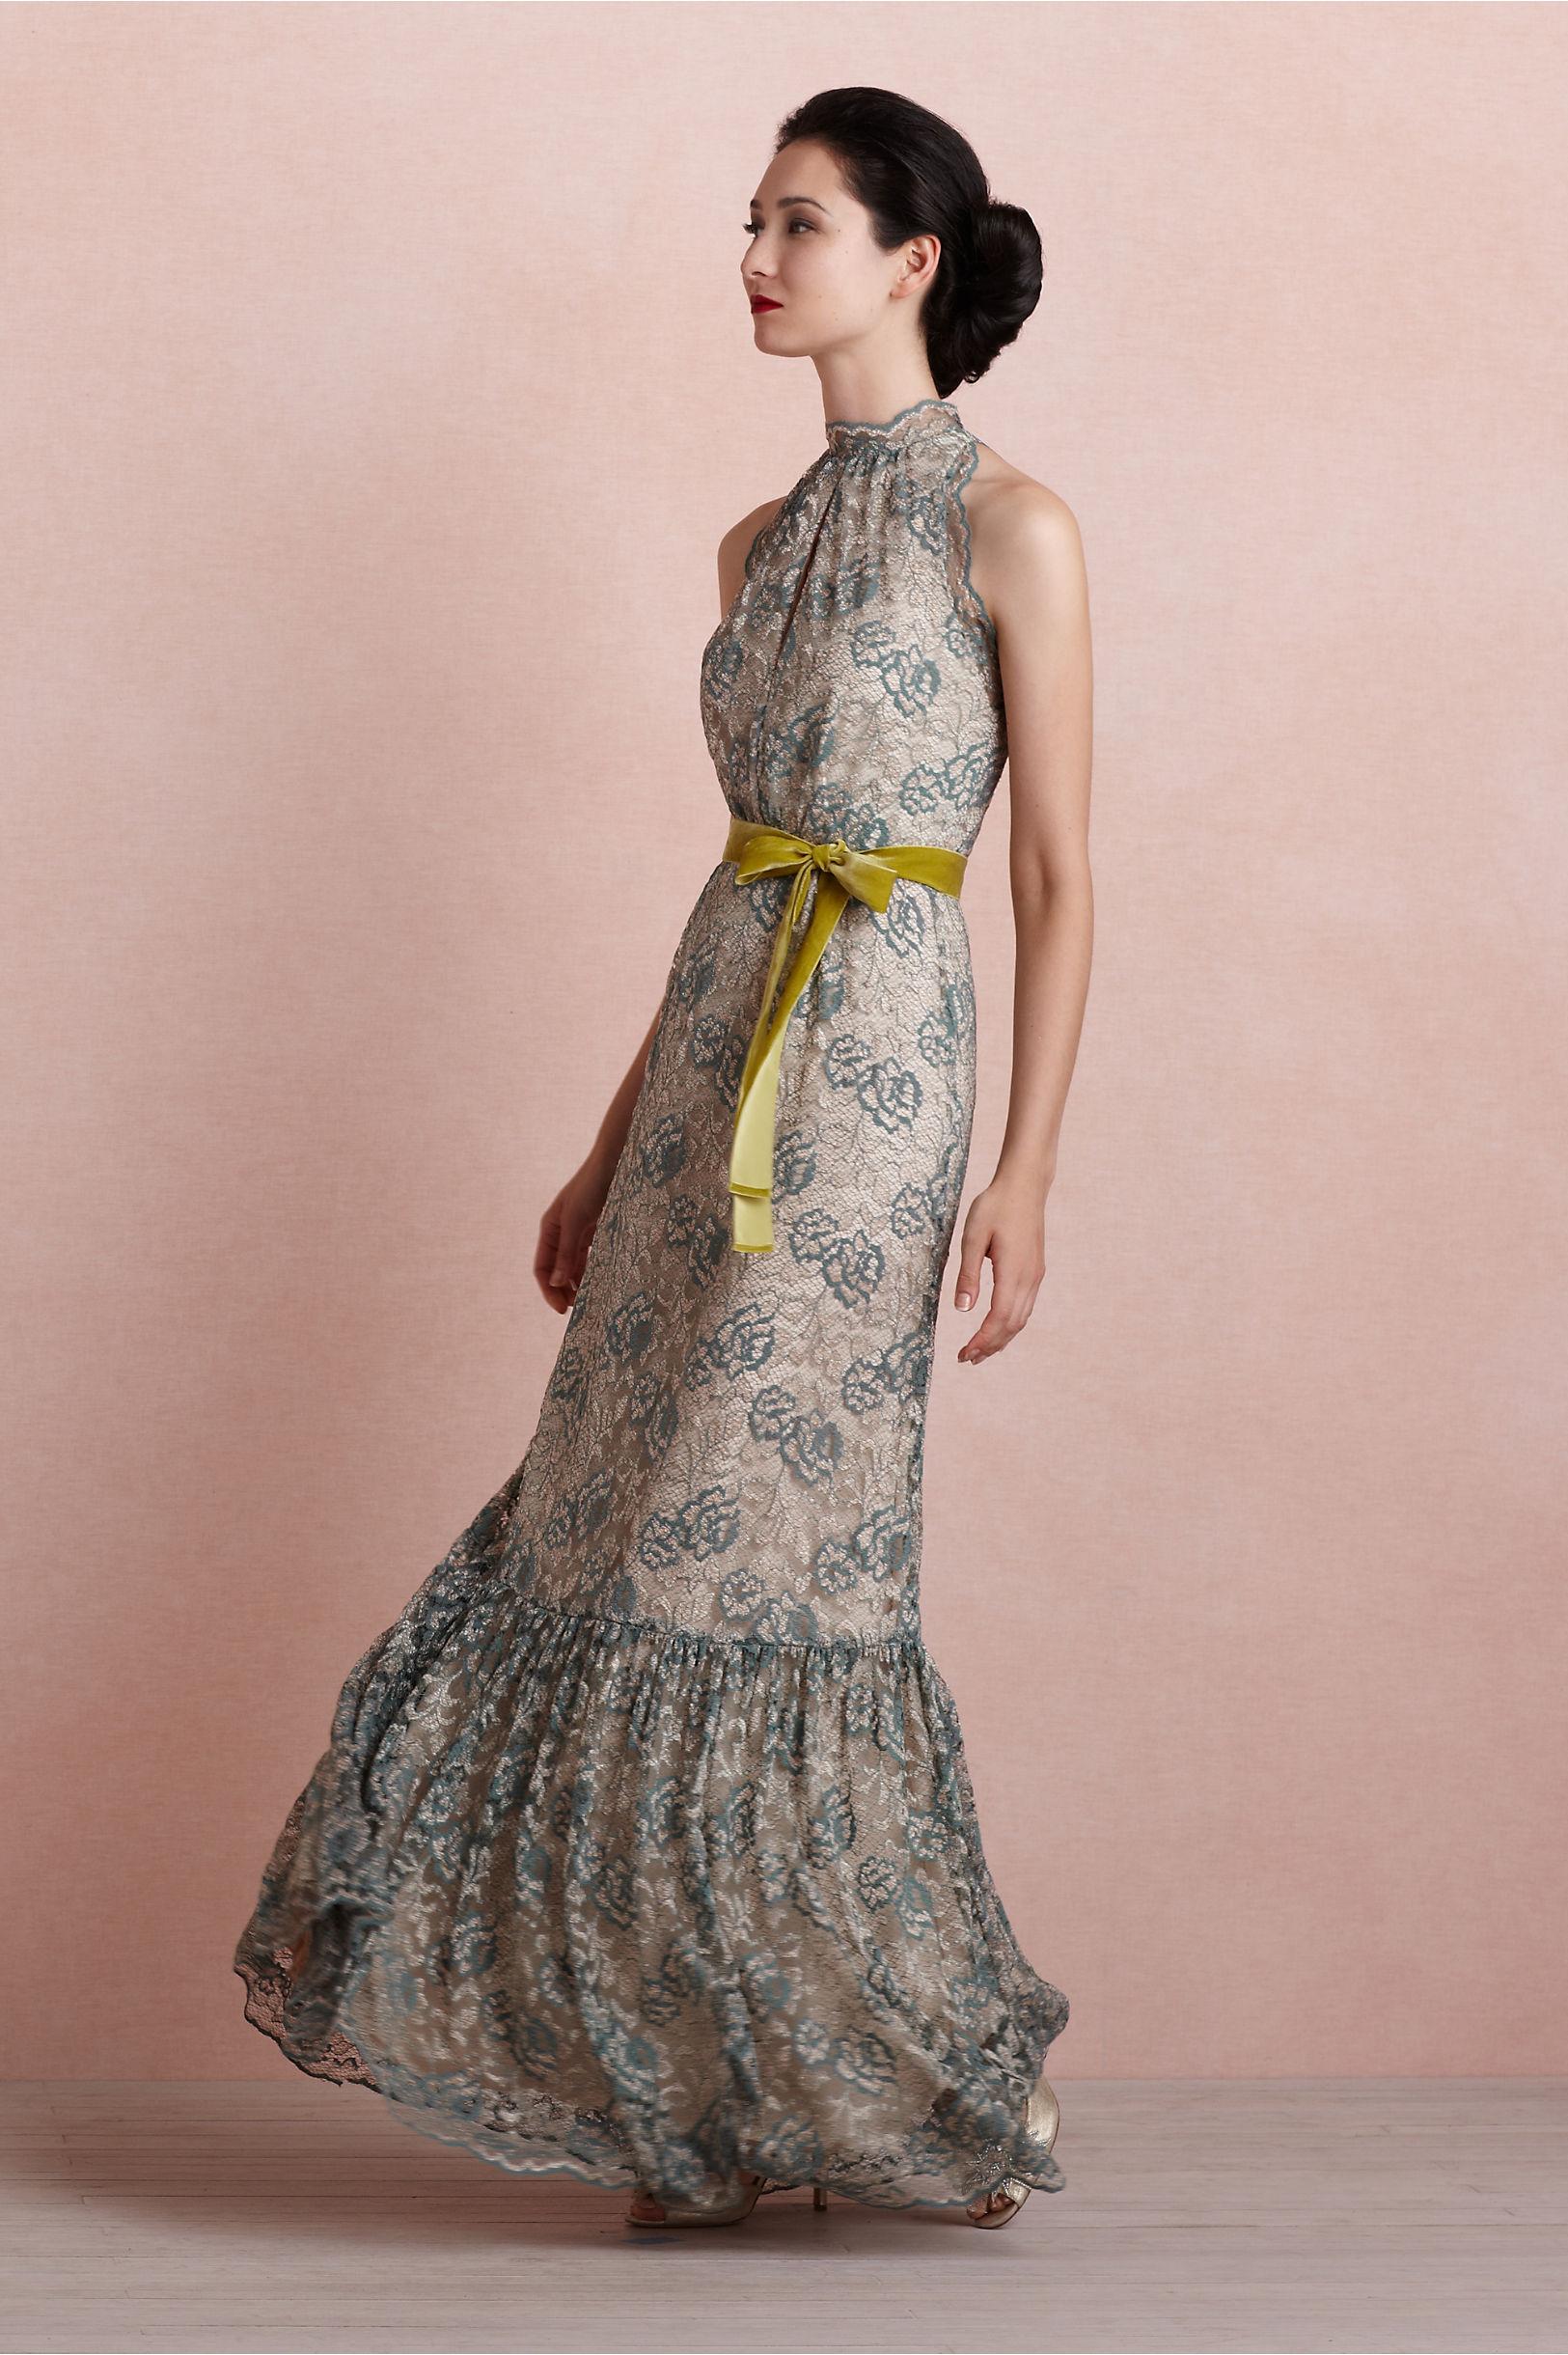 Snowdonia Dress in Bridal Party | BHLDN